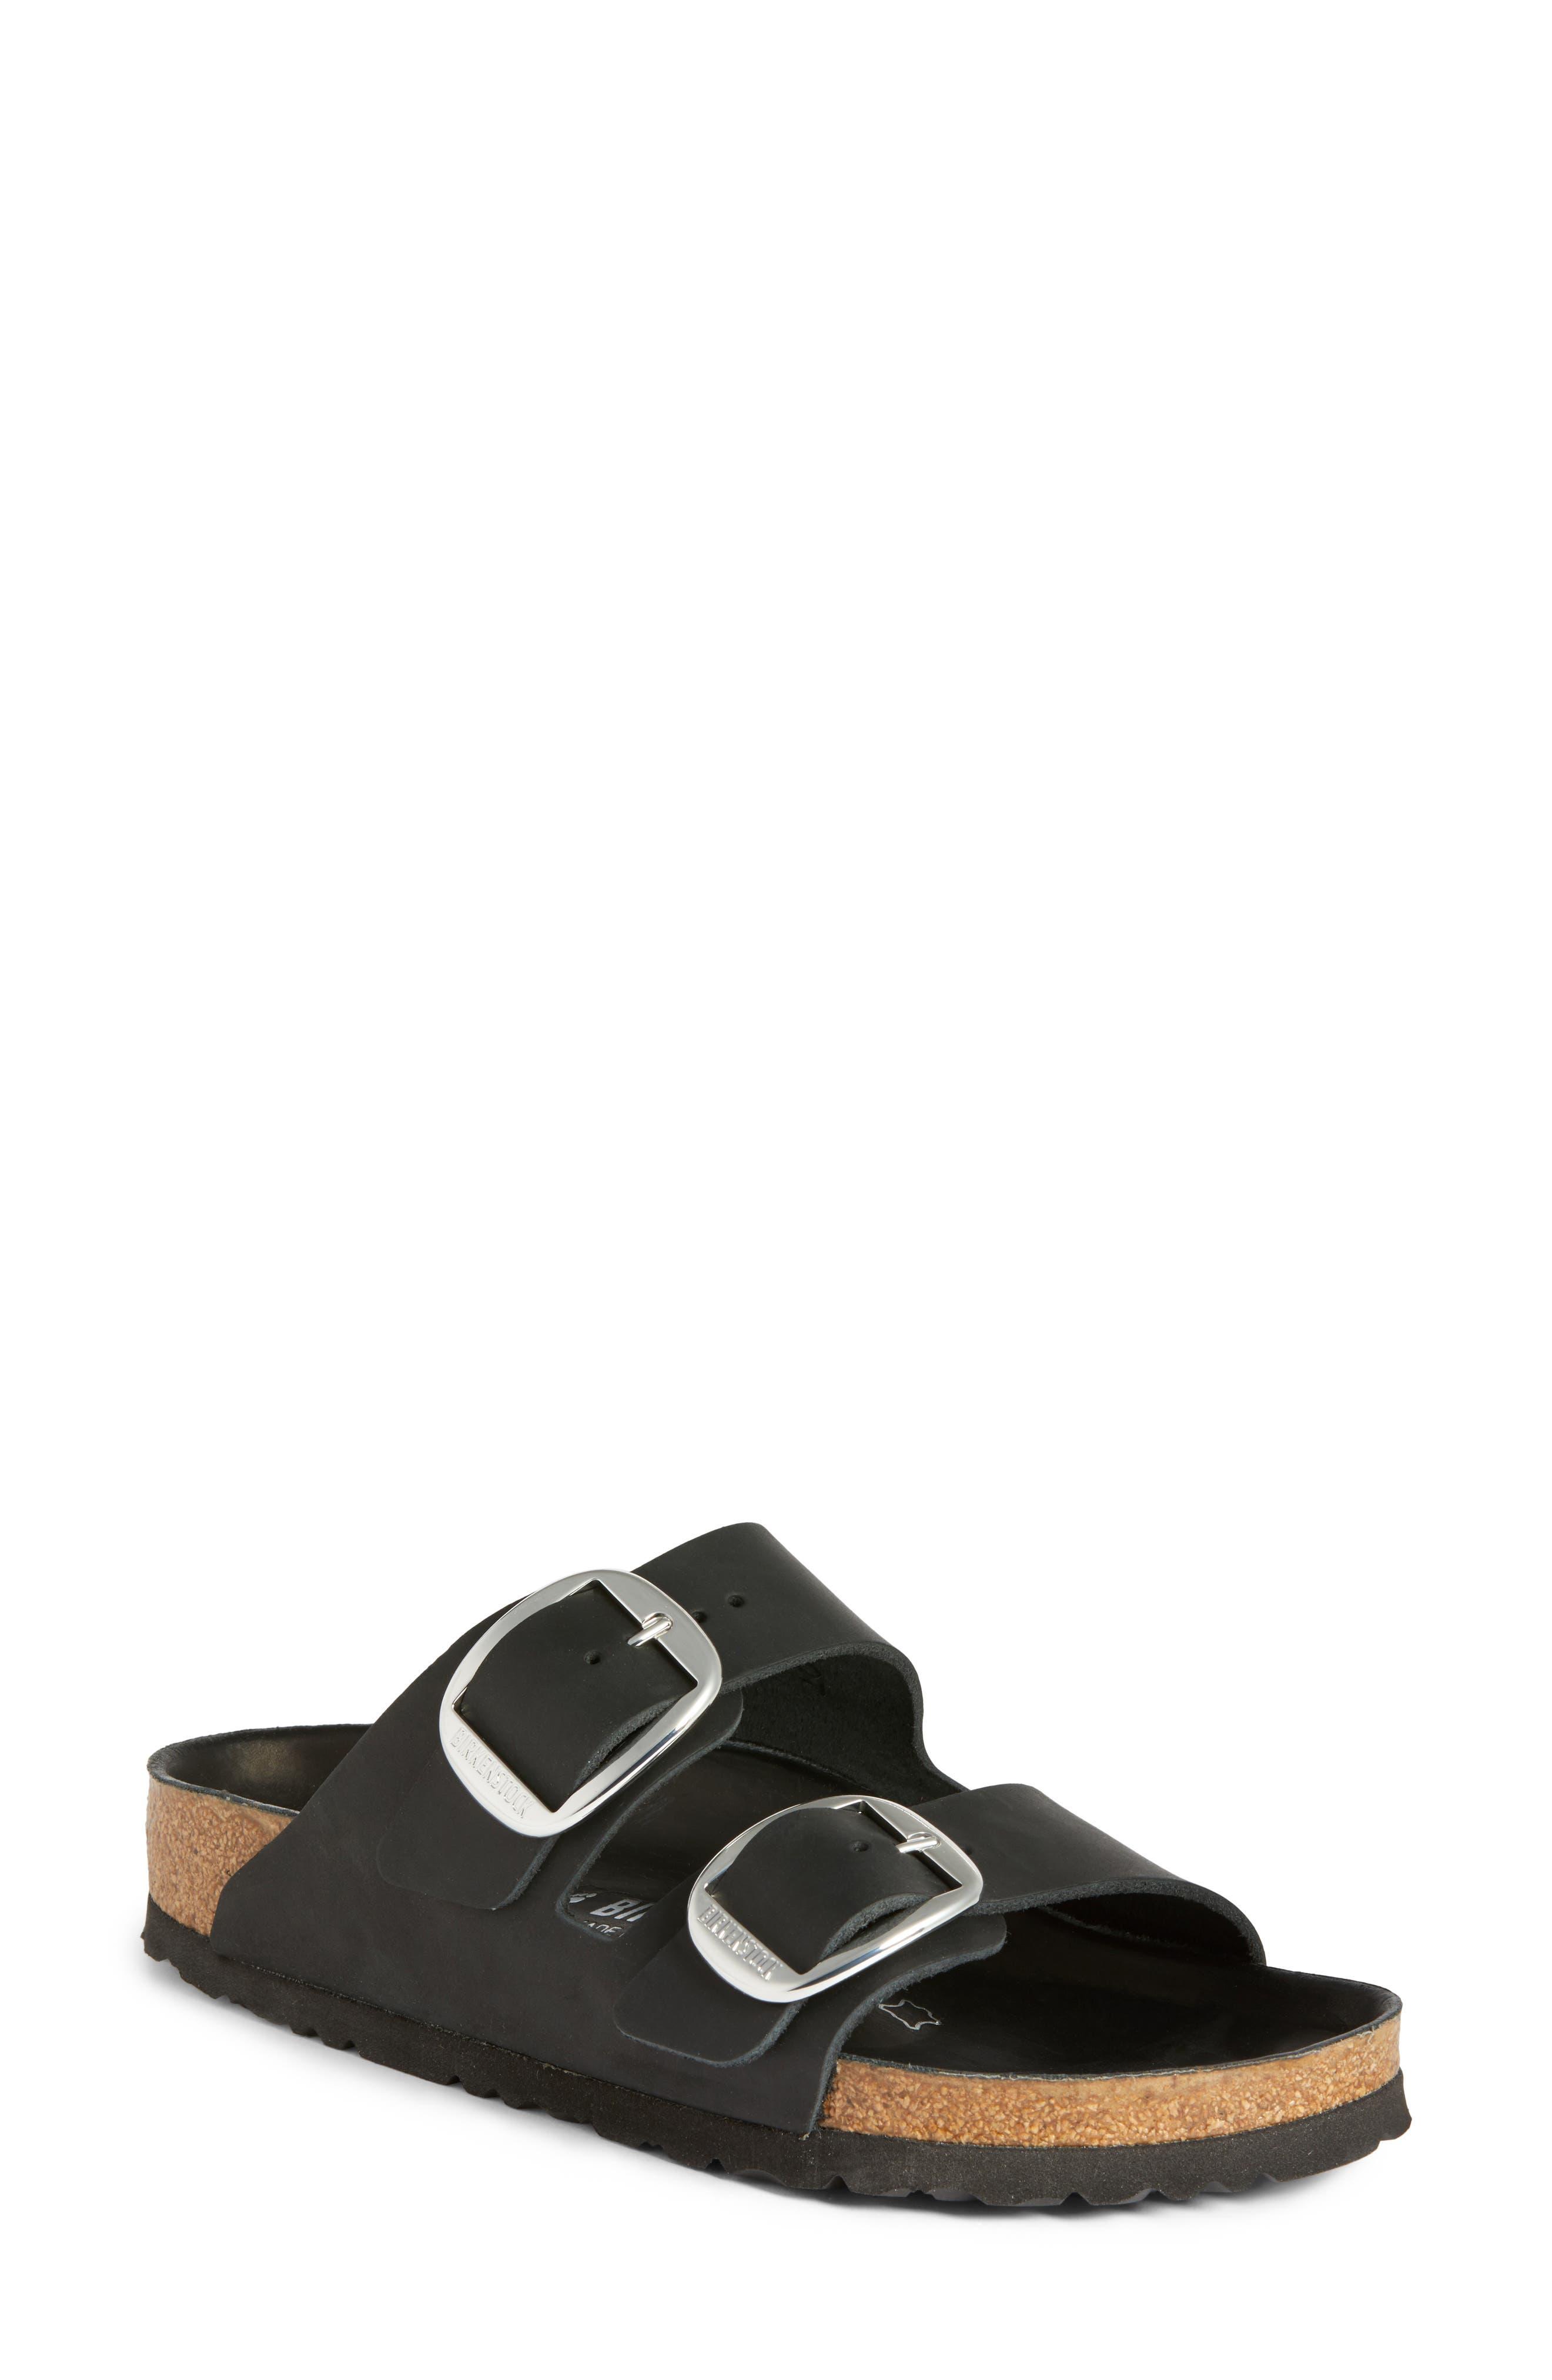 Arizona Big Buckle Slide Sandal,                             Main thumbnail 1, color,                             Black Leather